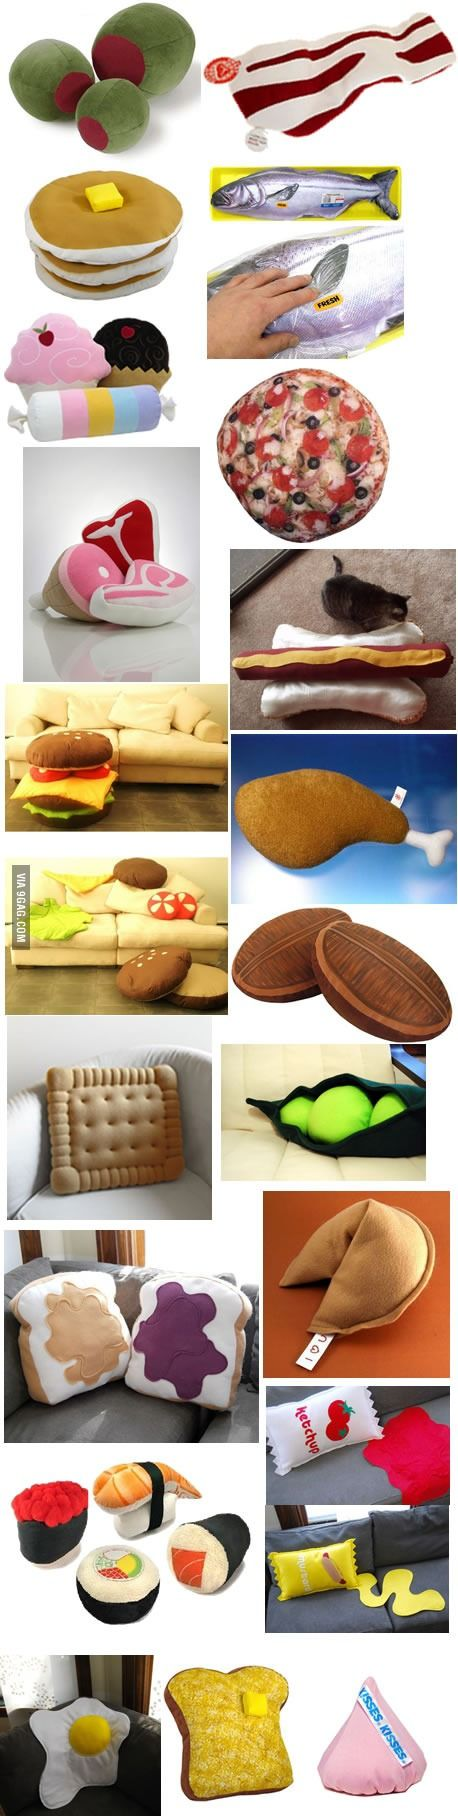 Food Pillows my favorite.